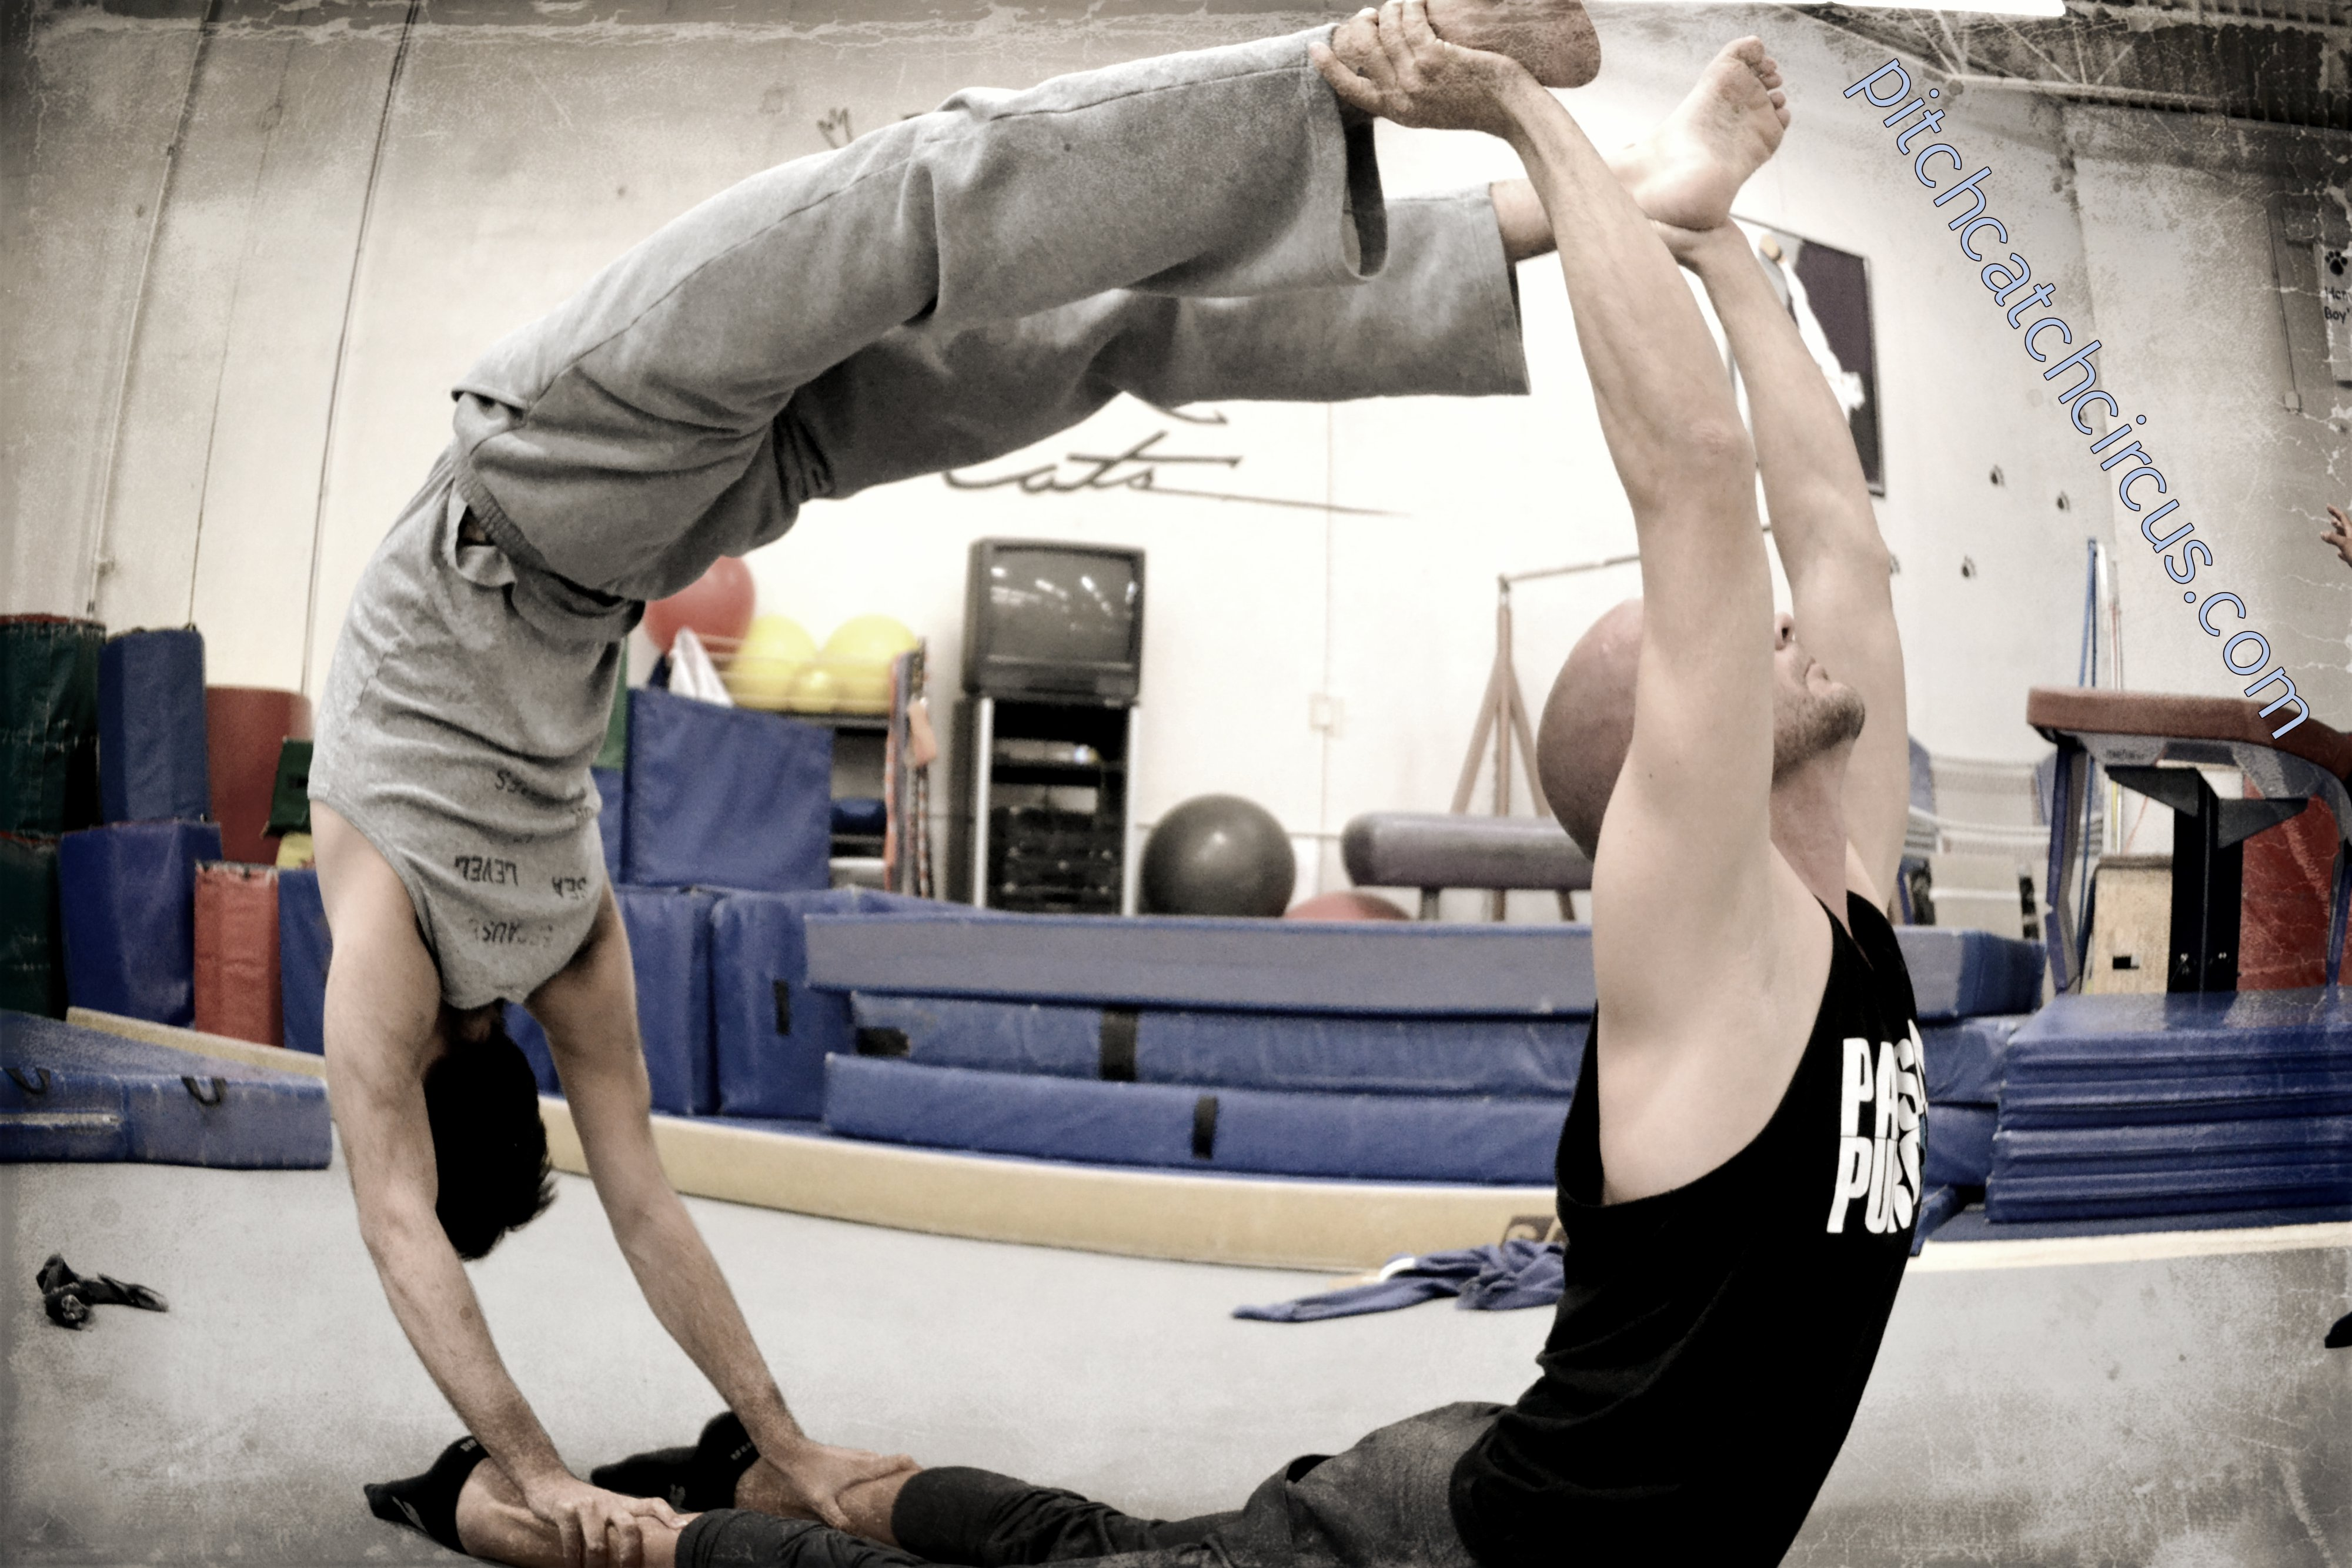 Austin and Bryan